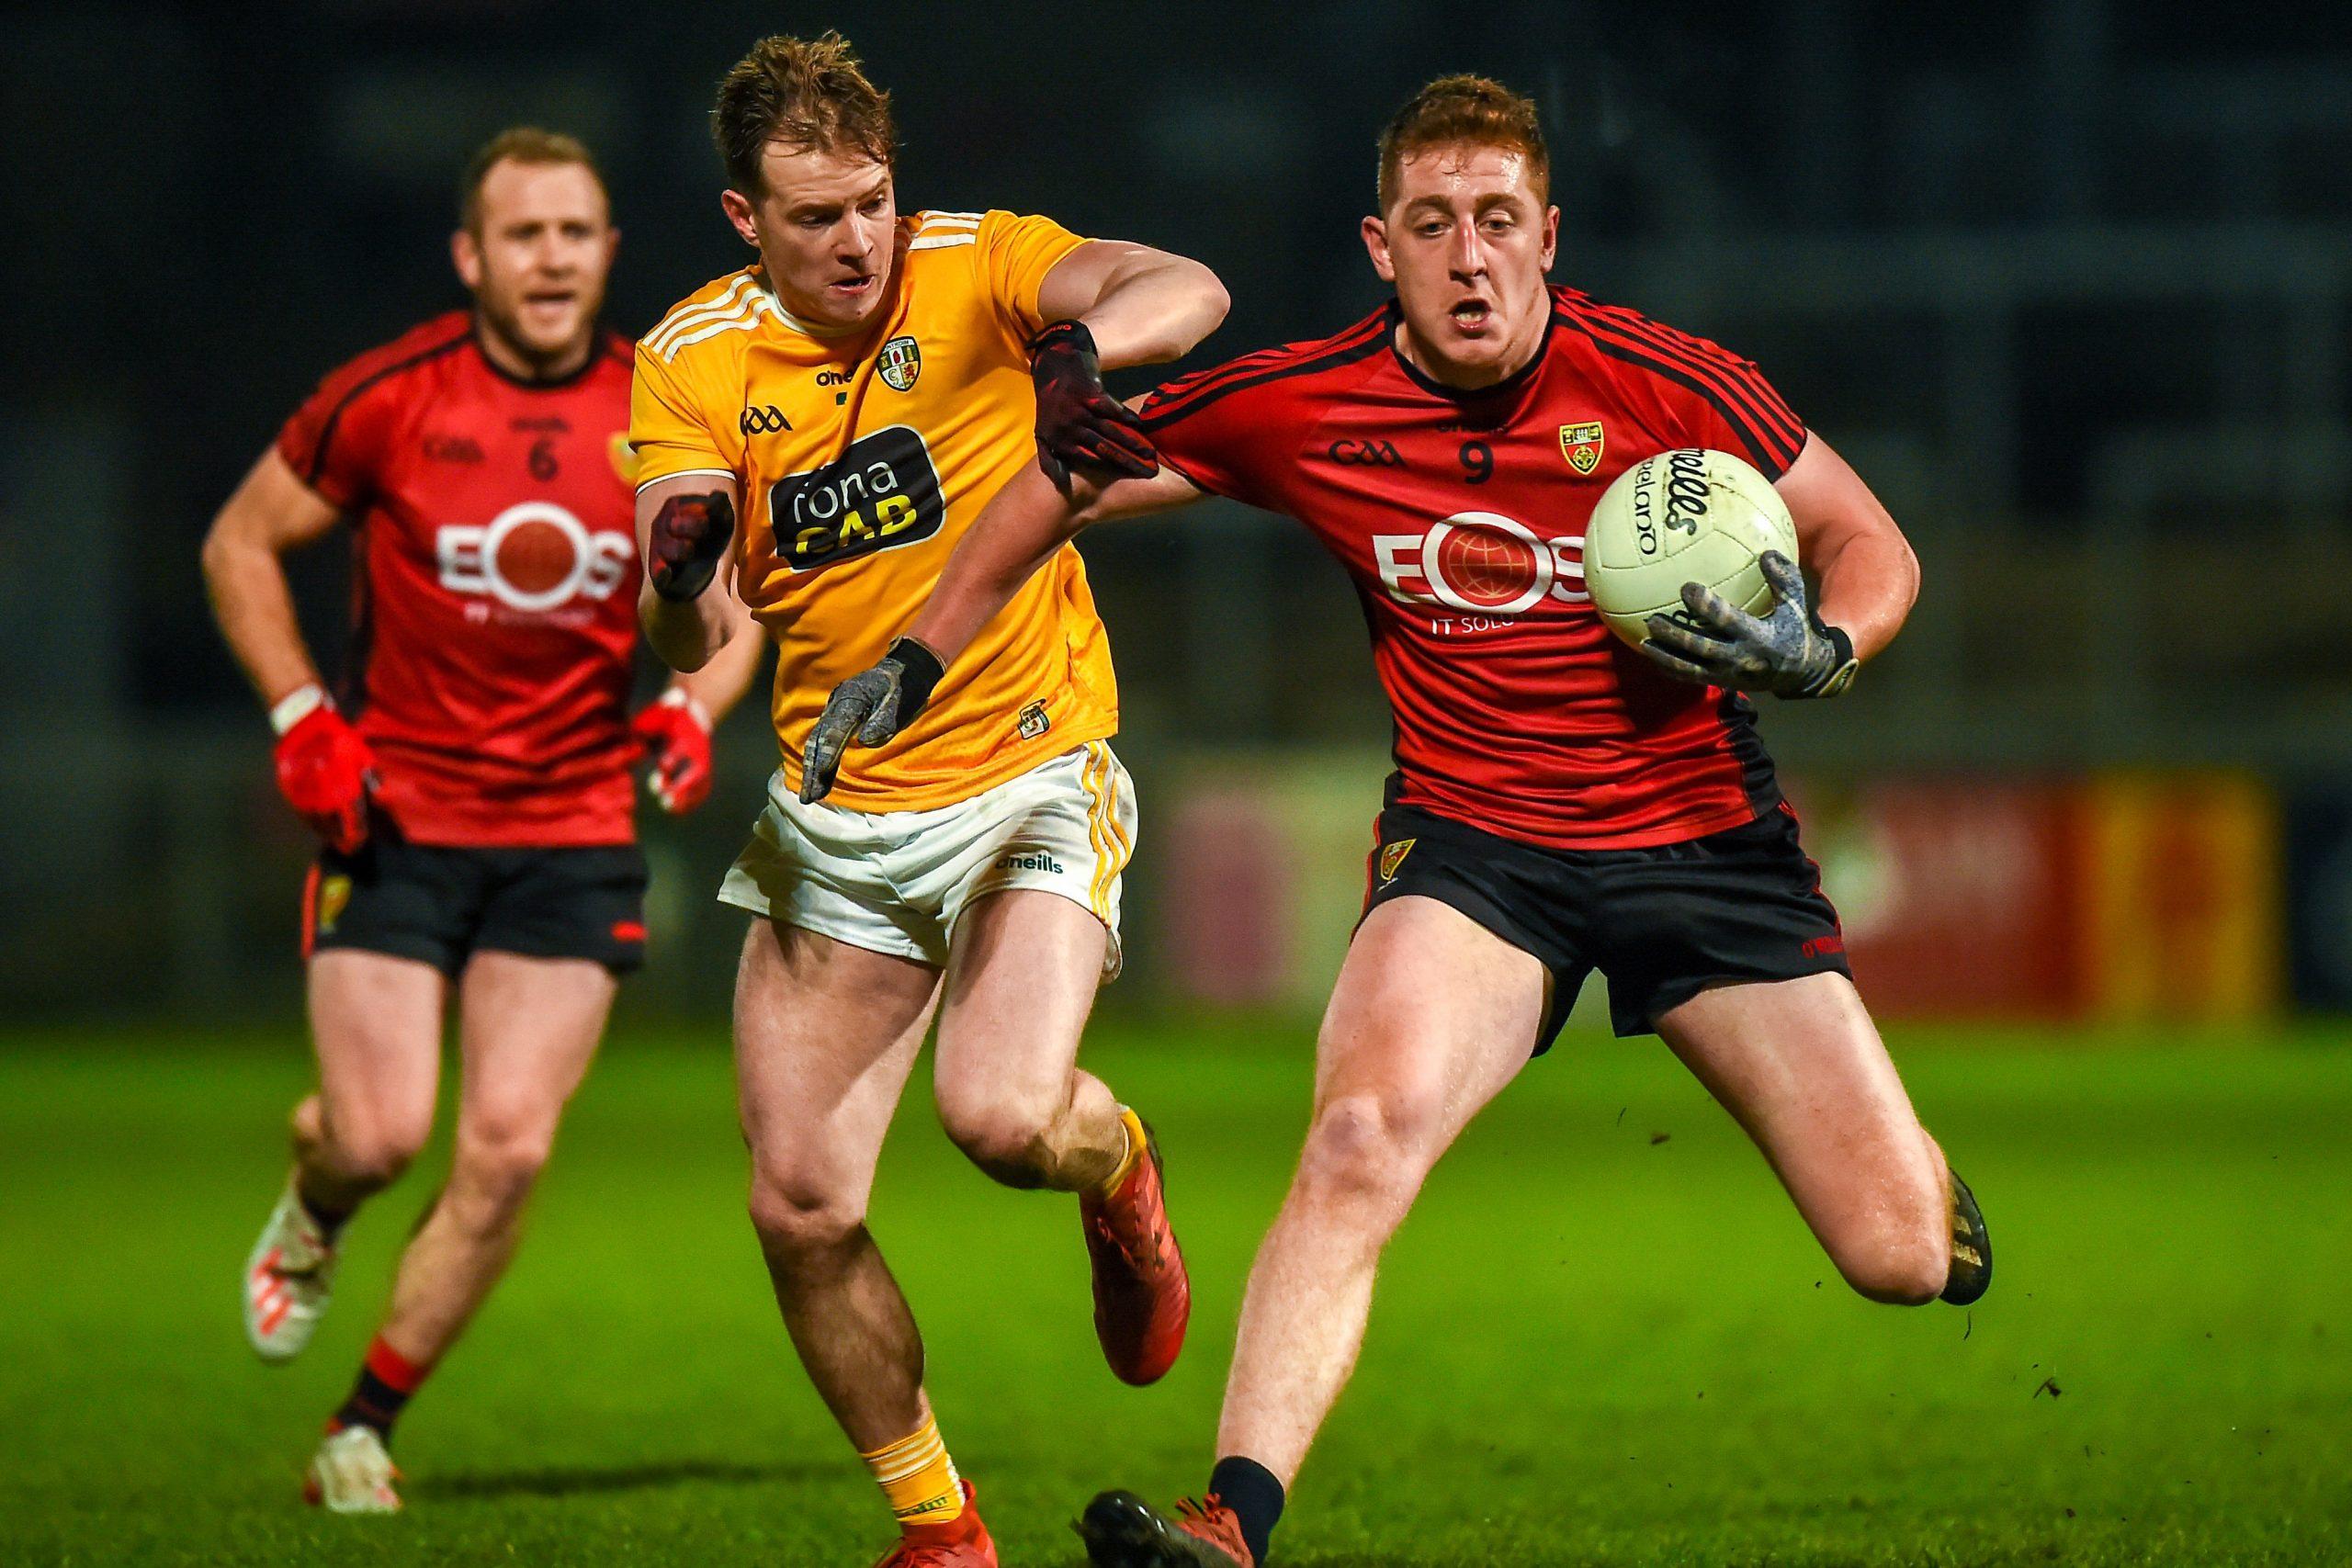 Bank of Ireland Dr McKenna Cup Round 3 report